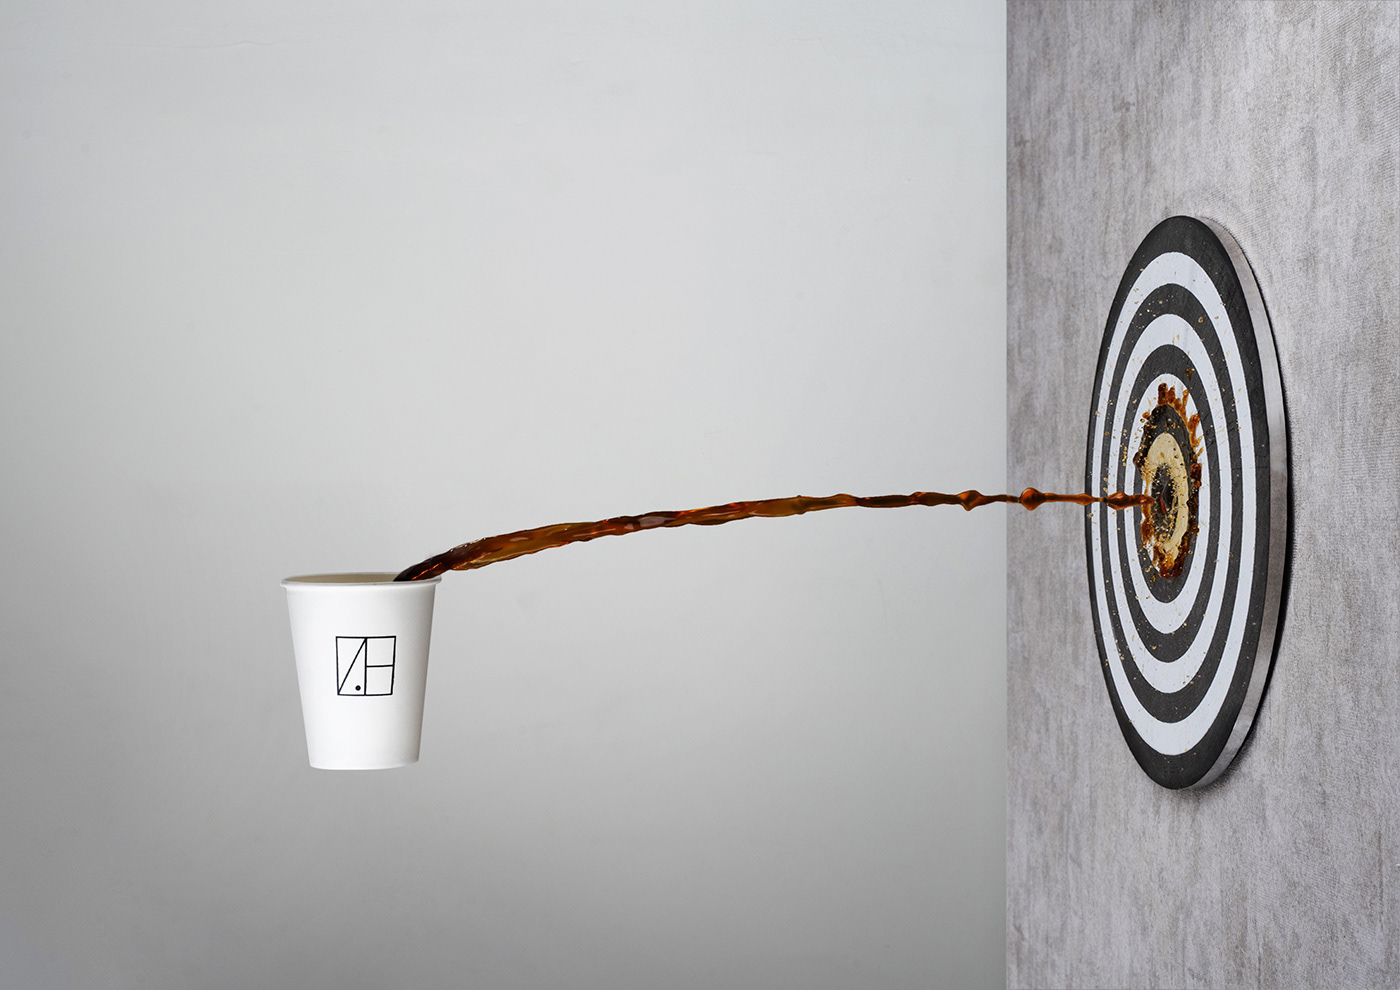 brand brand identity business cafe Coffee indonesia jakarta minimalist modern Productivity